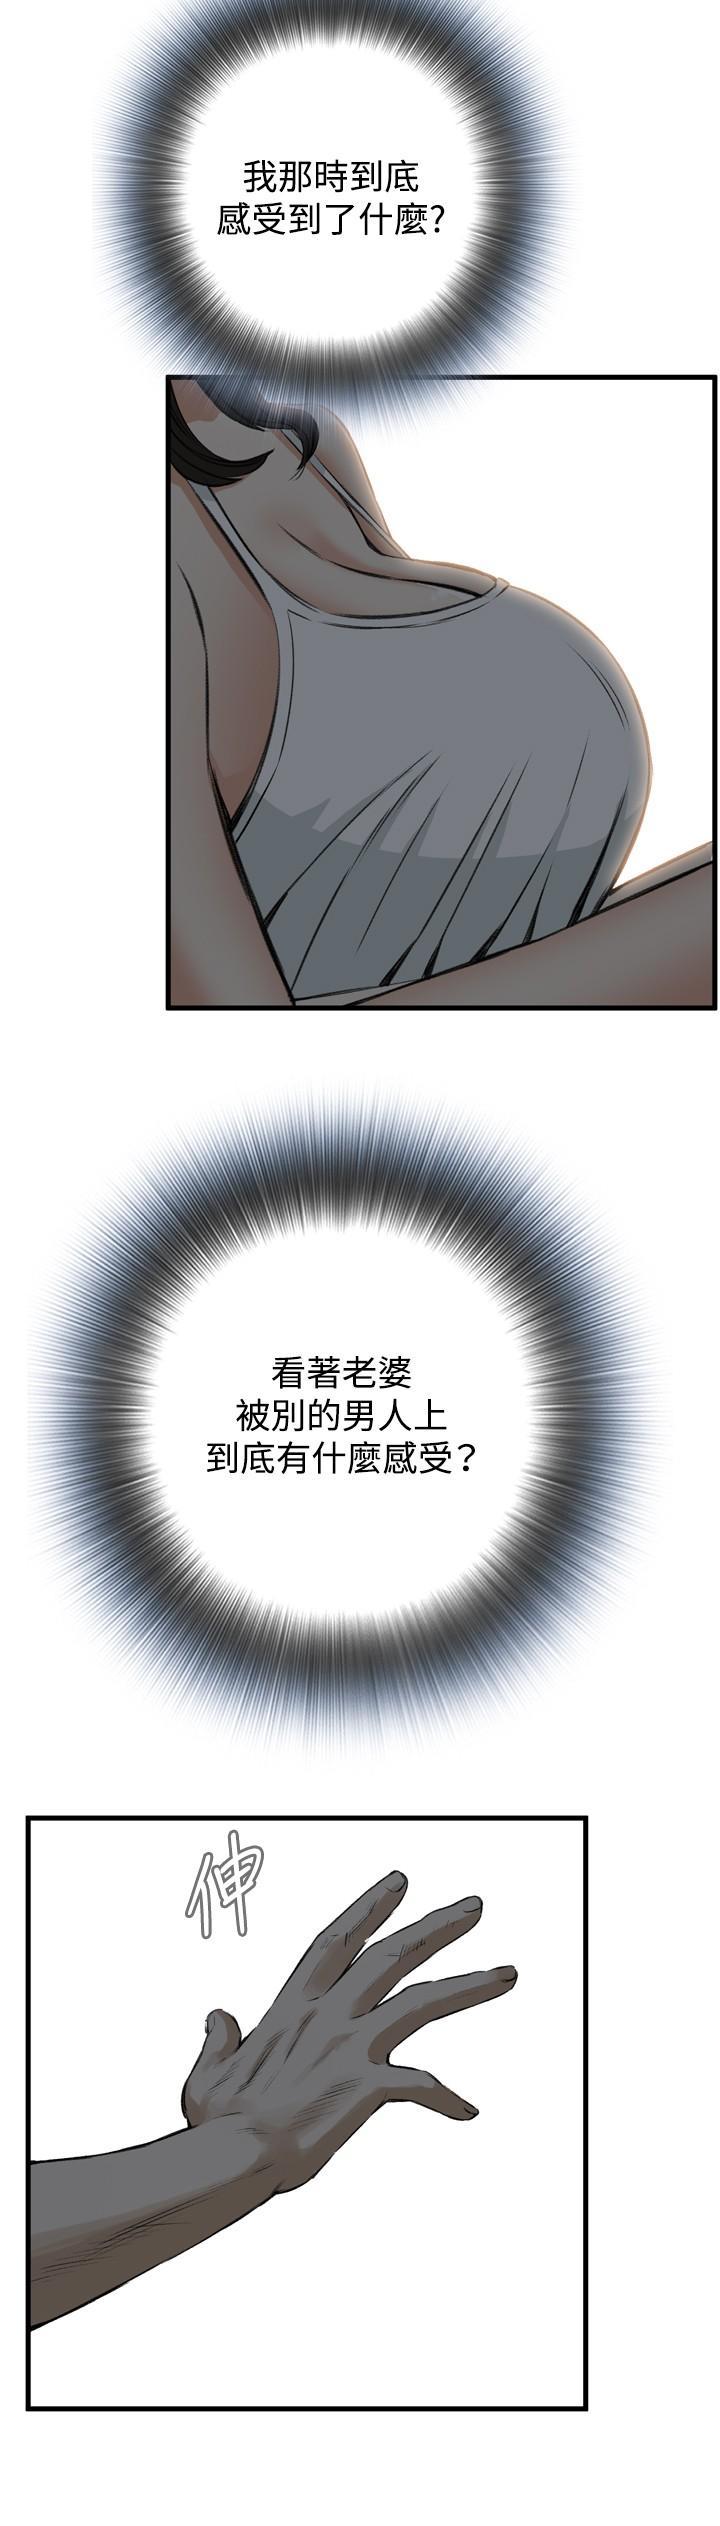 Take a Peek 偷窥 Ch.39~55 [Chinese]中文 192